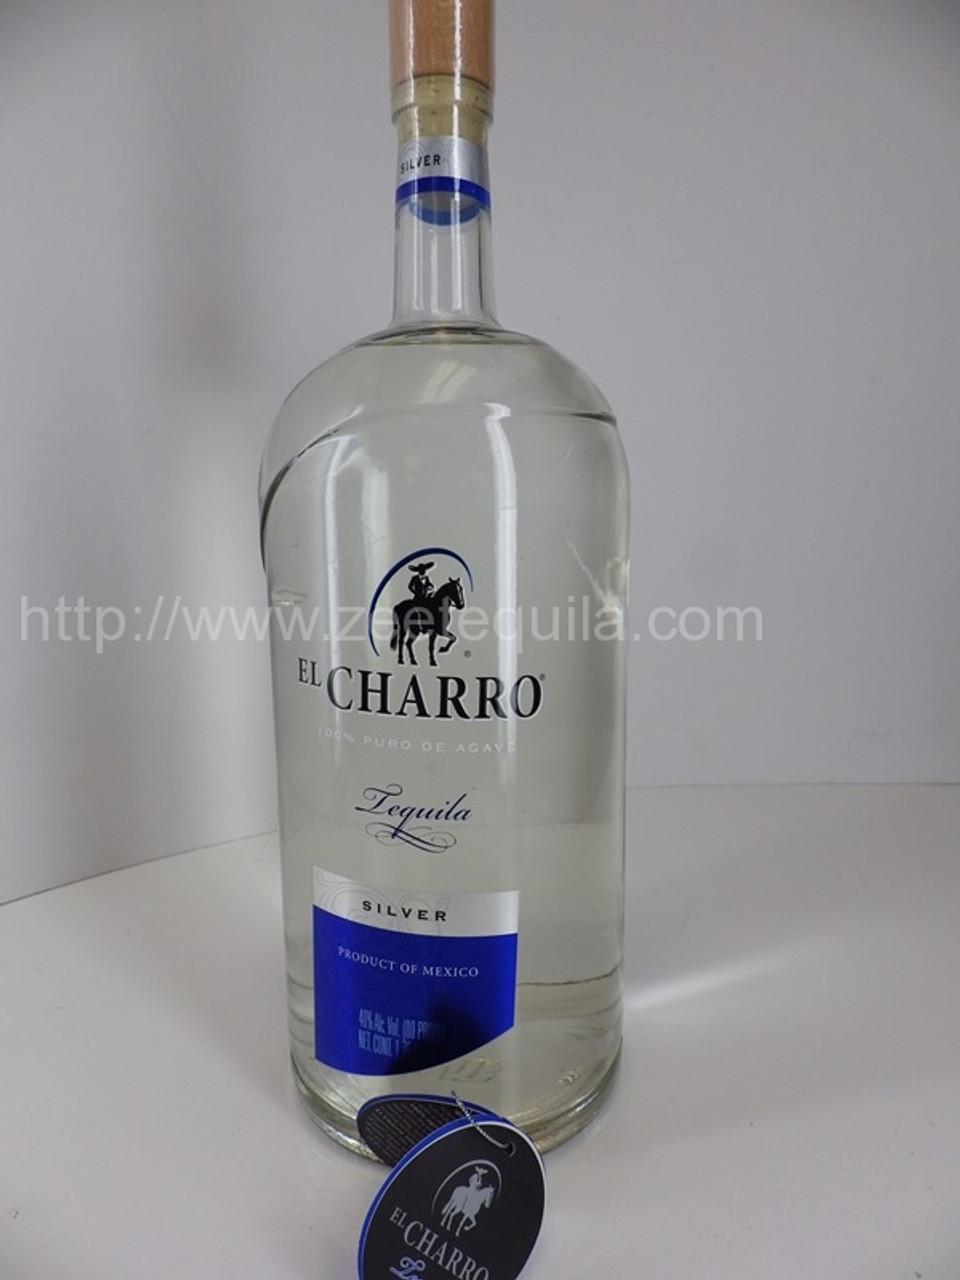 El Charro Silver Half Gallon Old Town Tequila